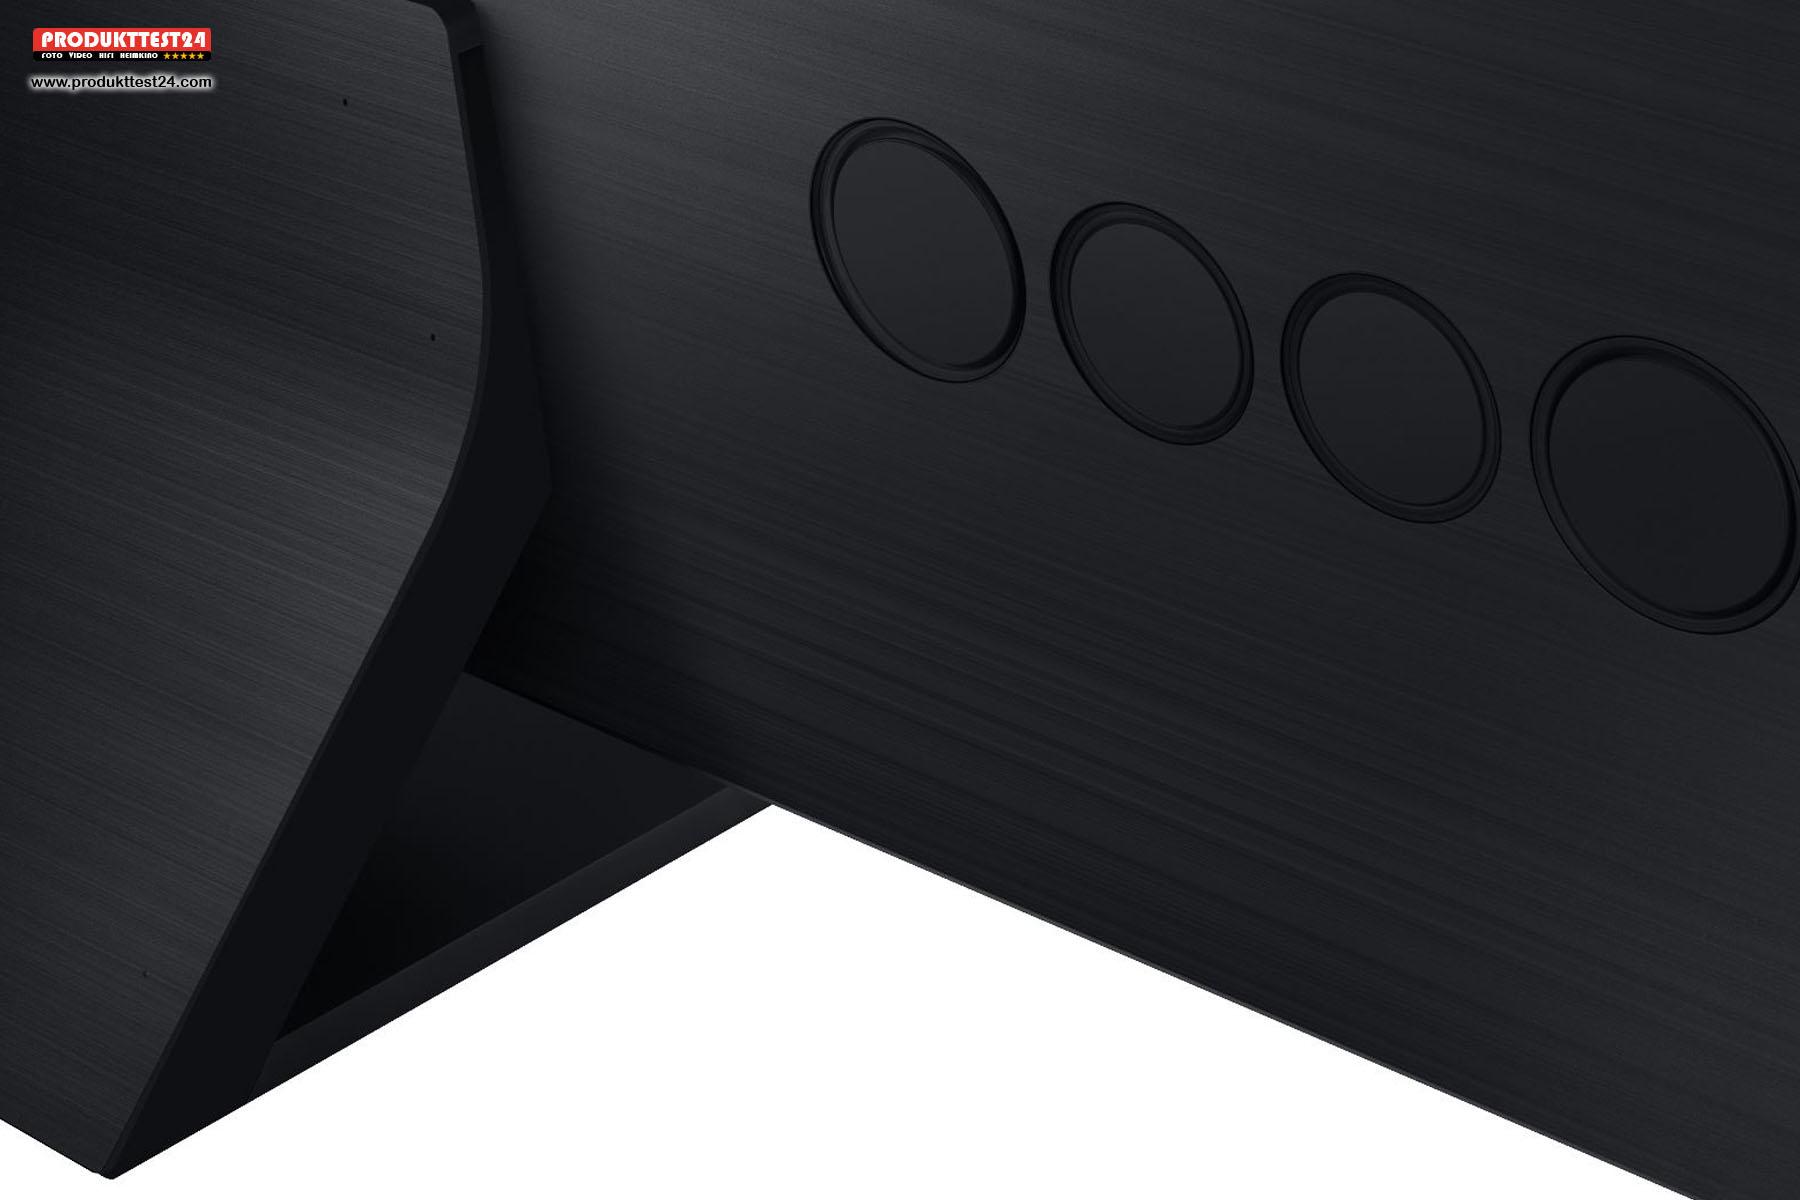 Das integrierte 4.2.2 Kanal Soundsystem des Samsung GQ75Q950T